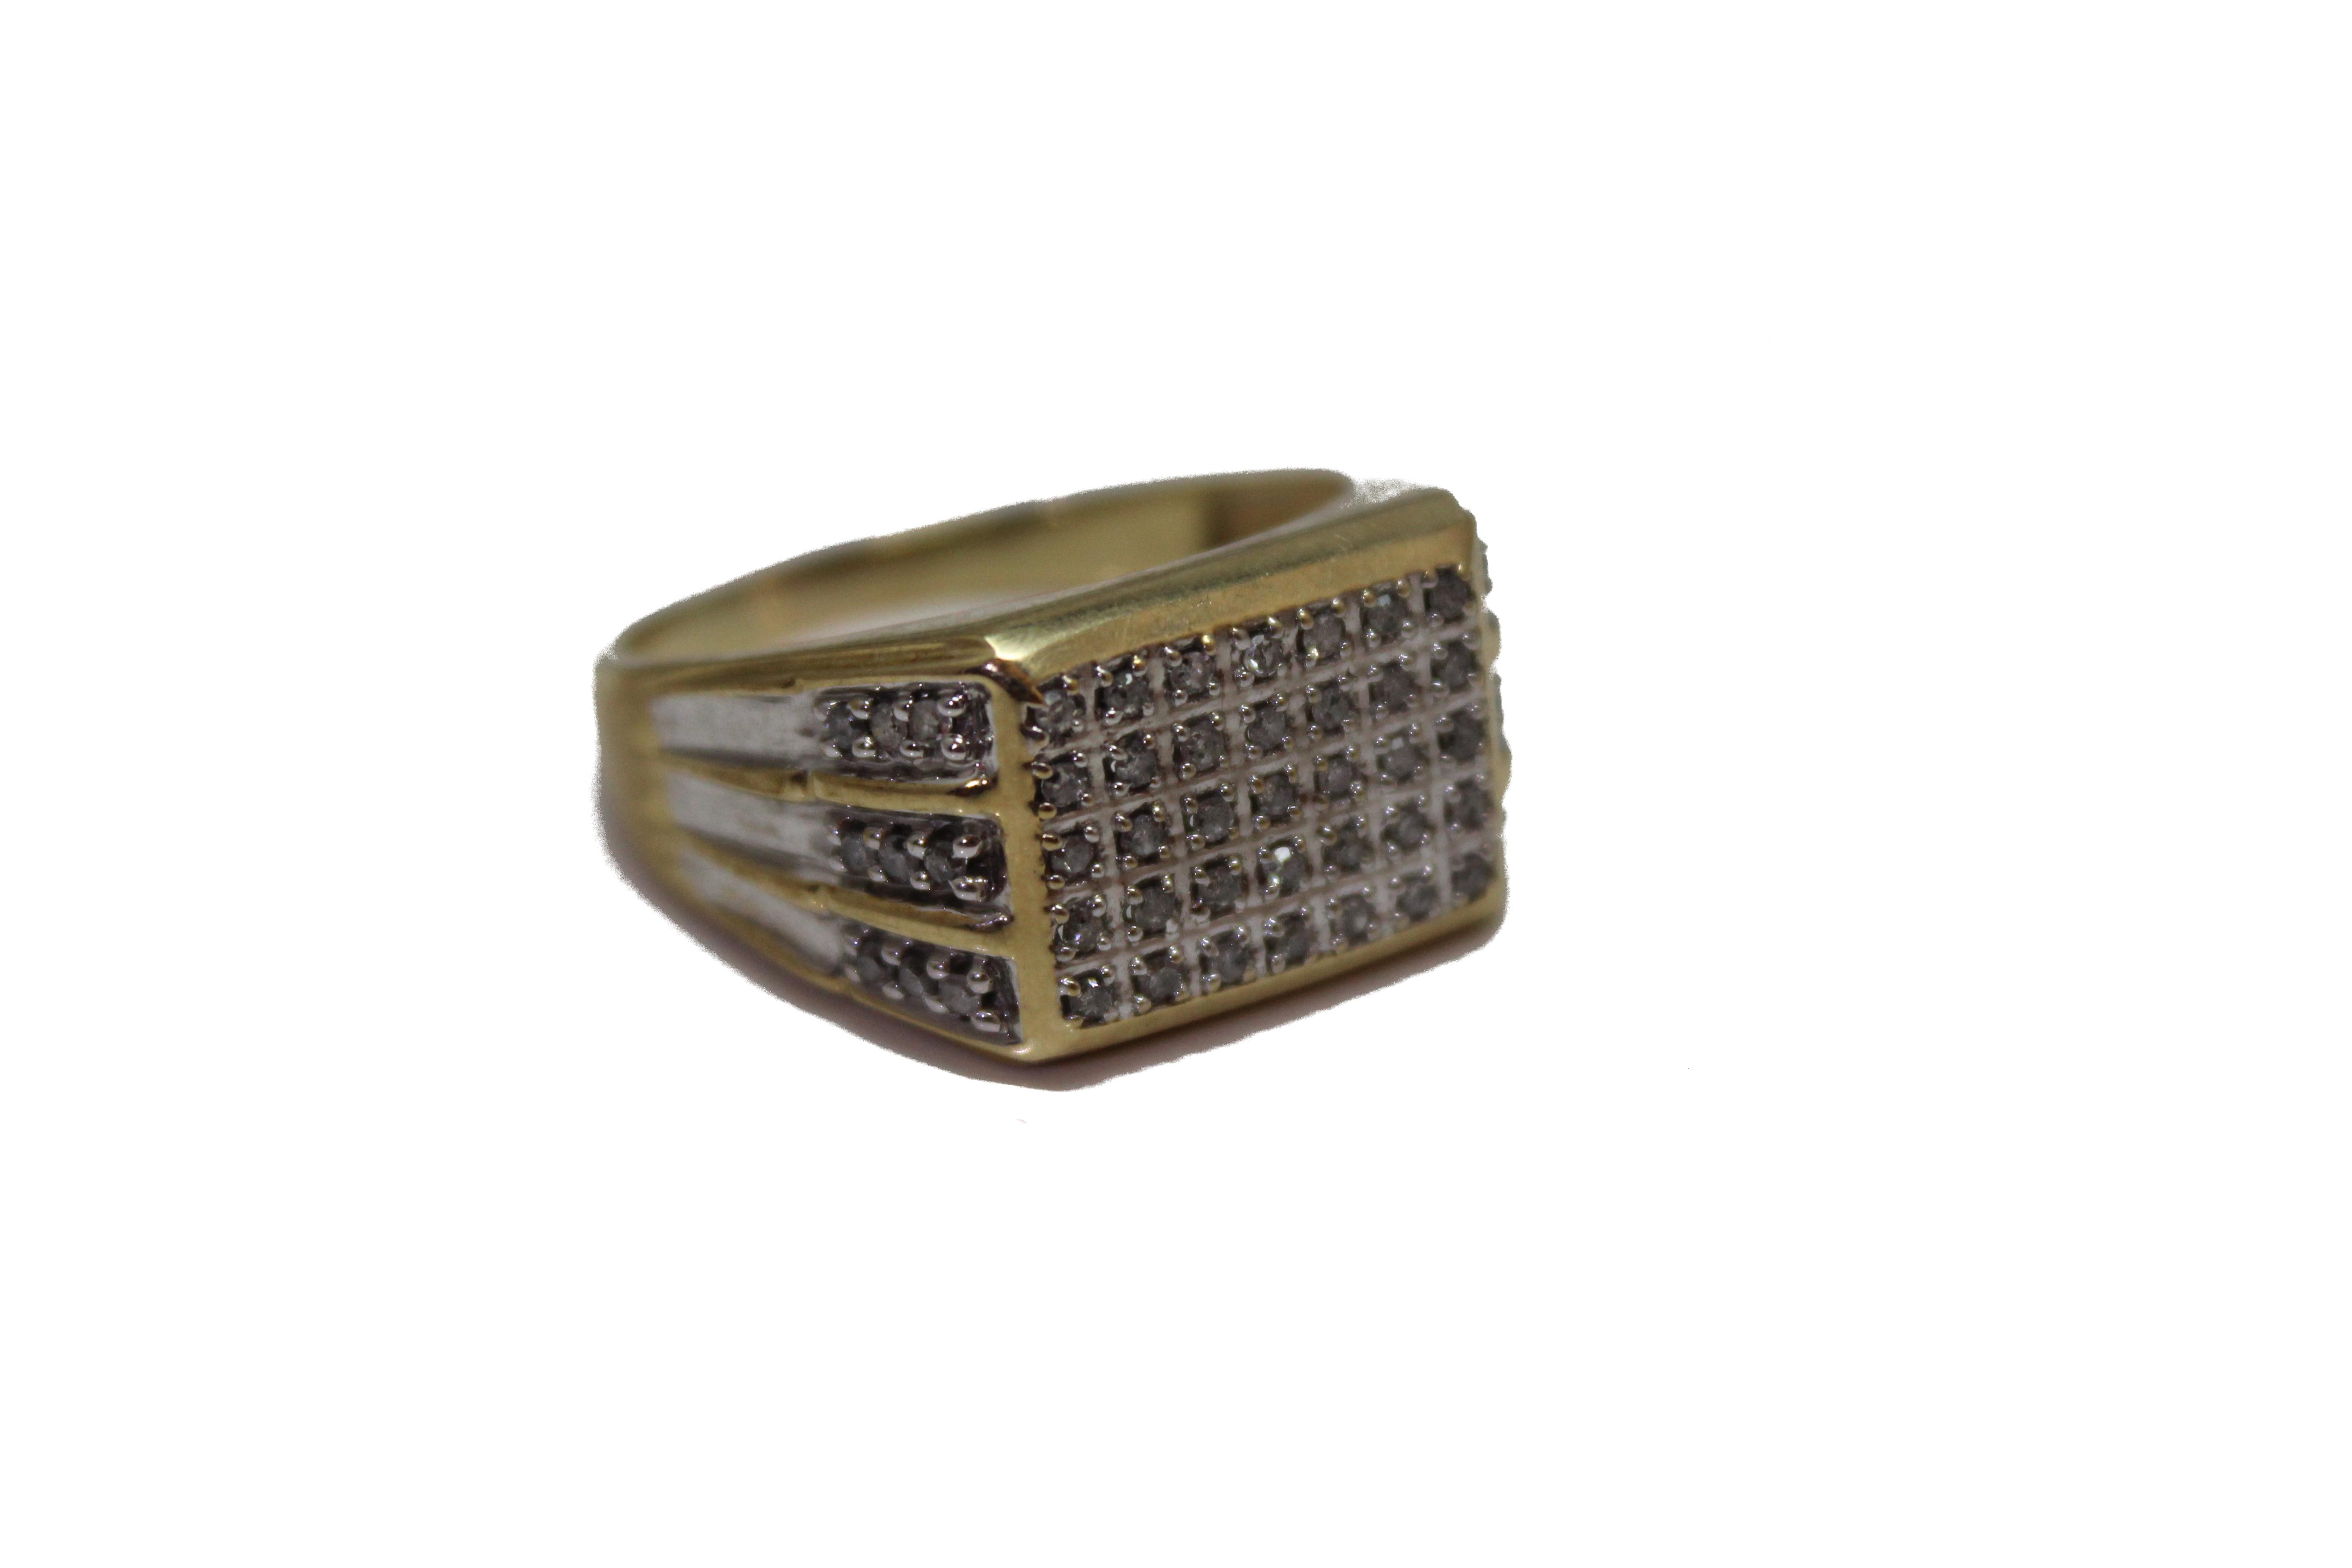 9ct gents diamond ring £445 z+1